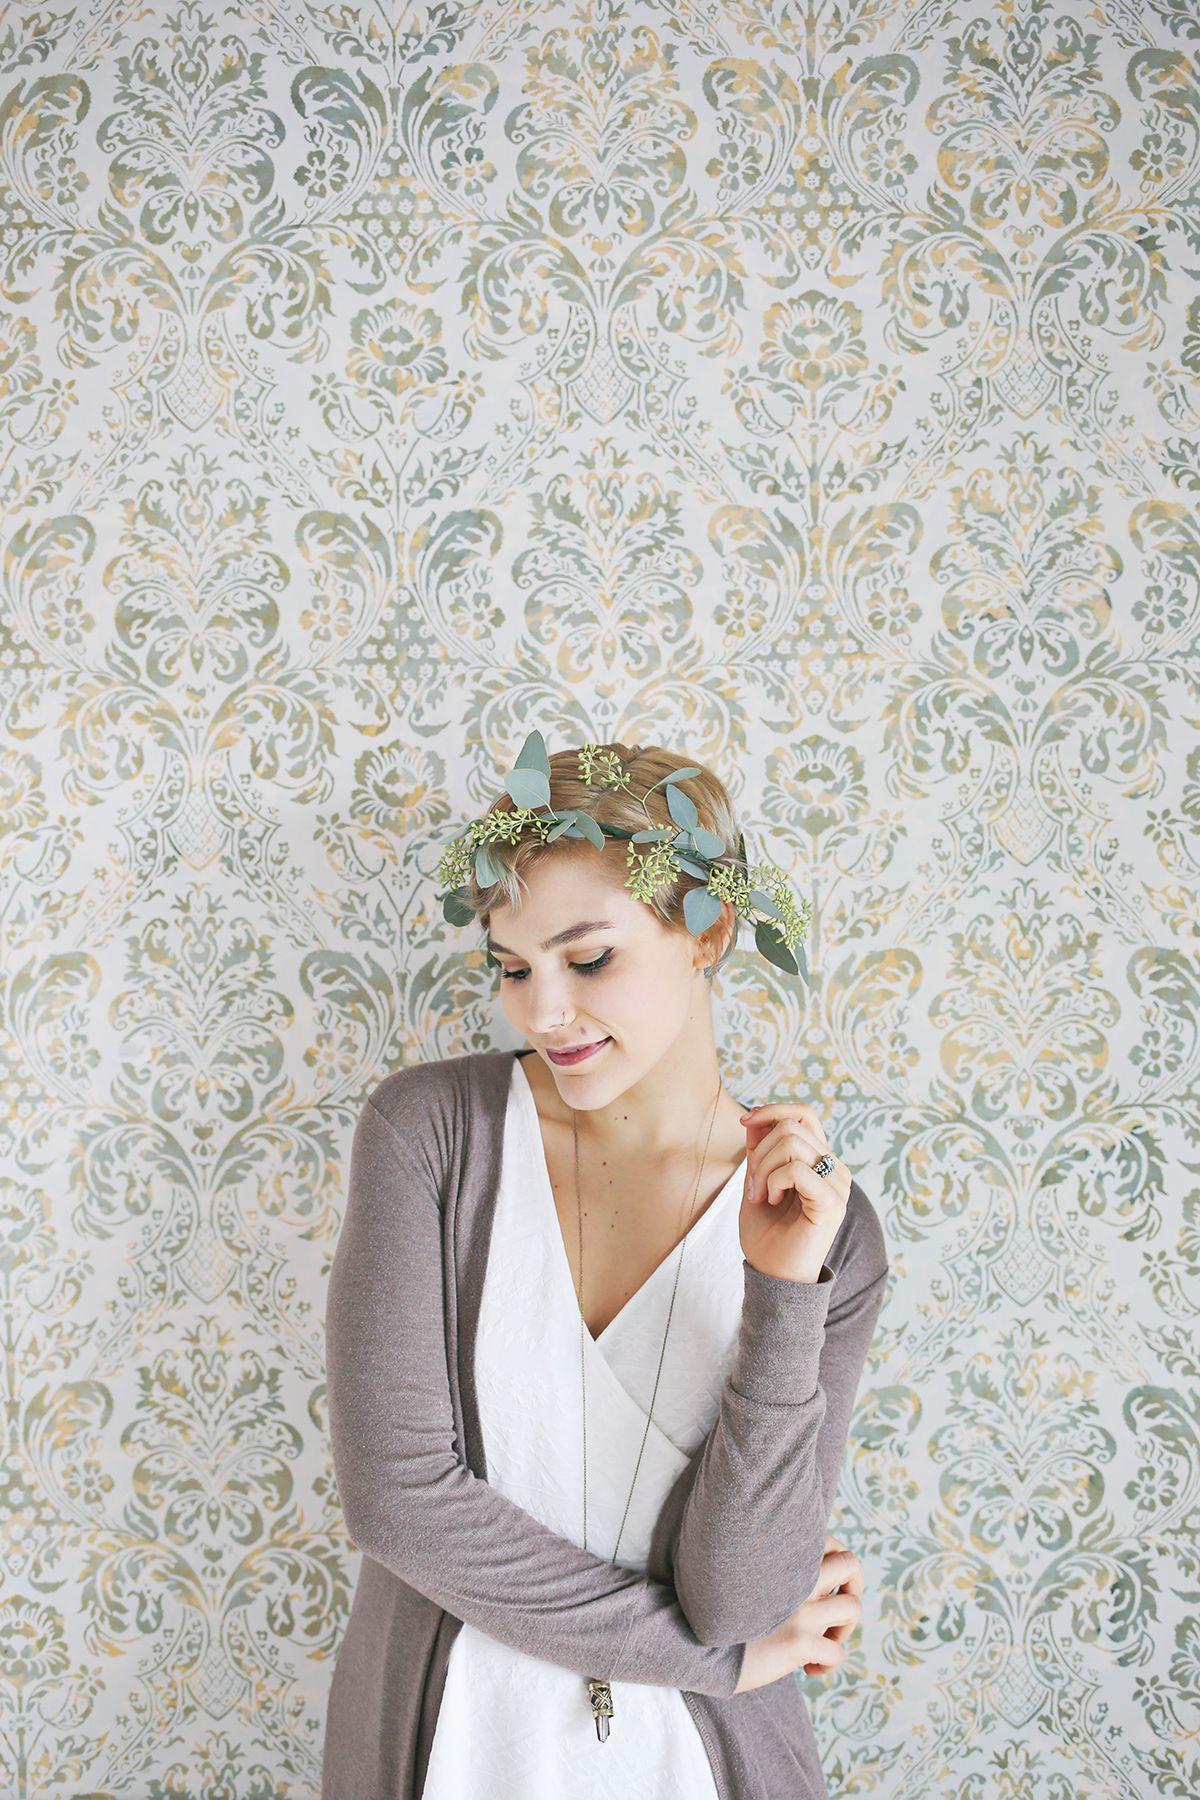 How to make eucalyptus hair wreaths find your floral pinterest how to make eucalyptus hair wreaths izmirmasajfo